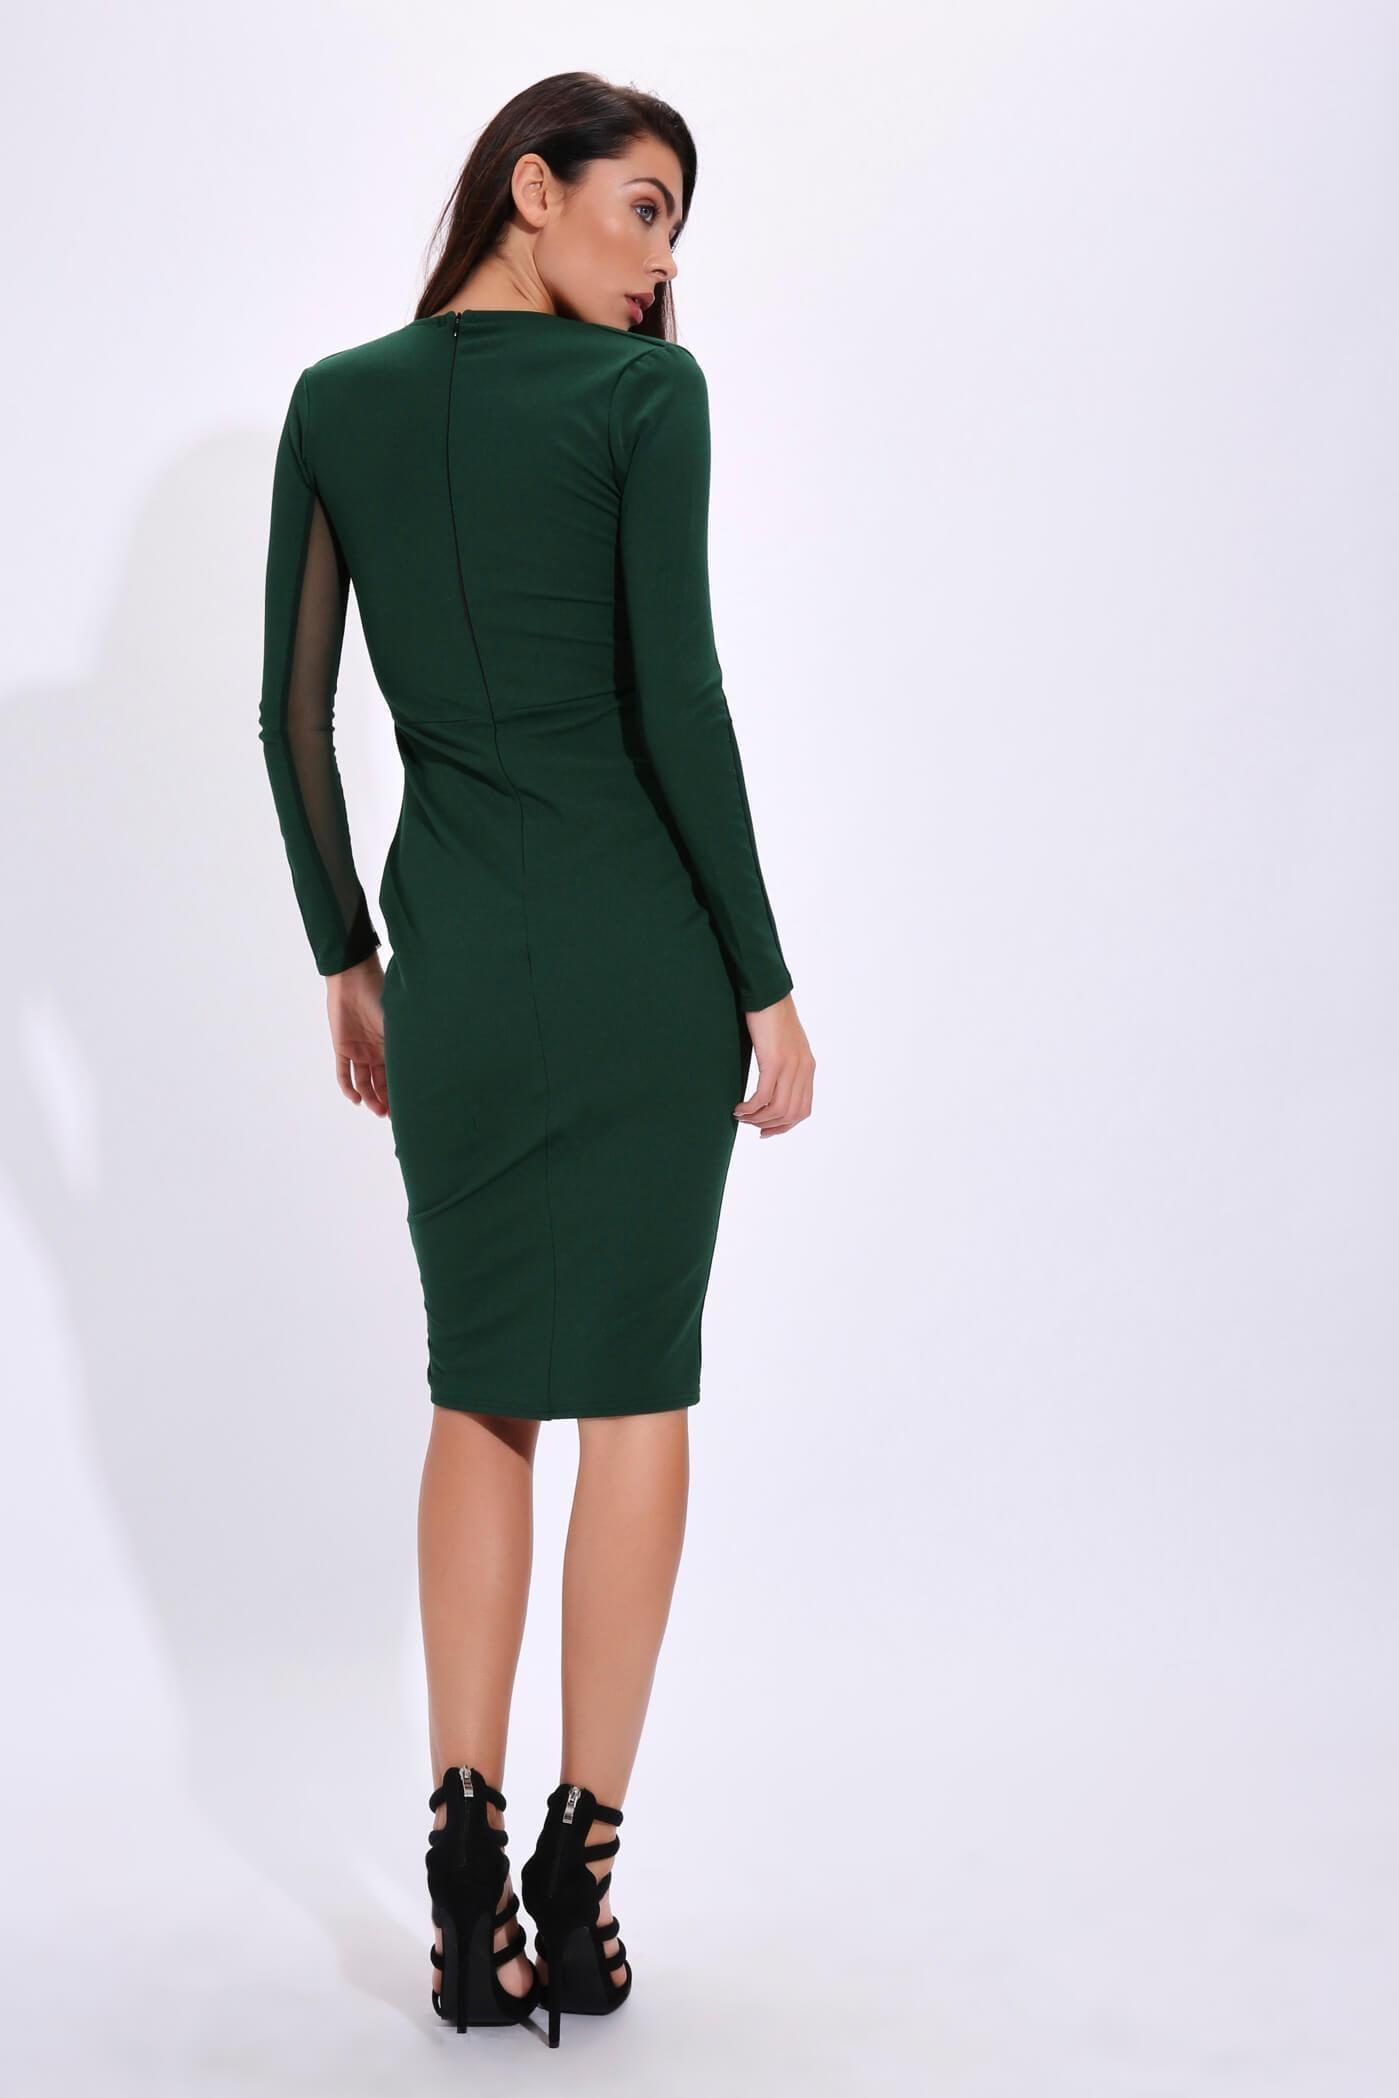 ecc328a053 Dark Green Plunge Neck Long Sheer Sleeve Bodycon Dress   bodycondresslongsleeve